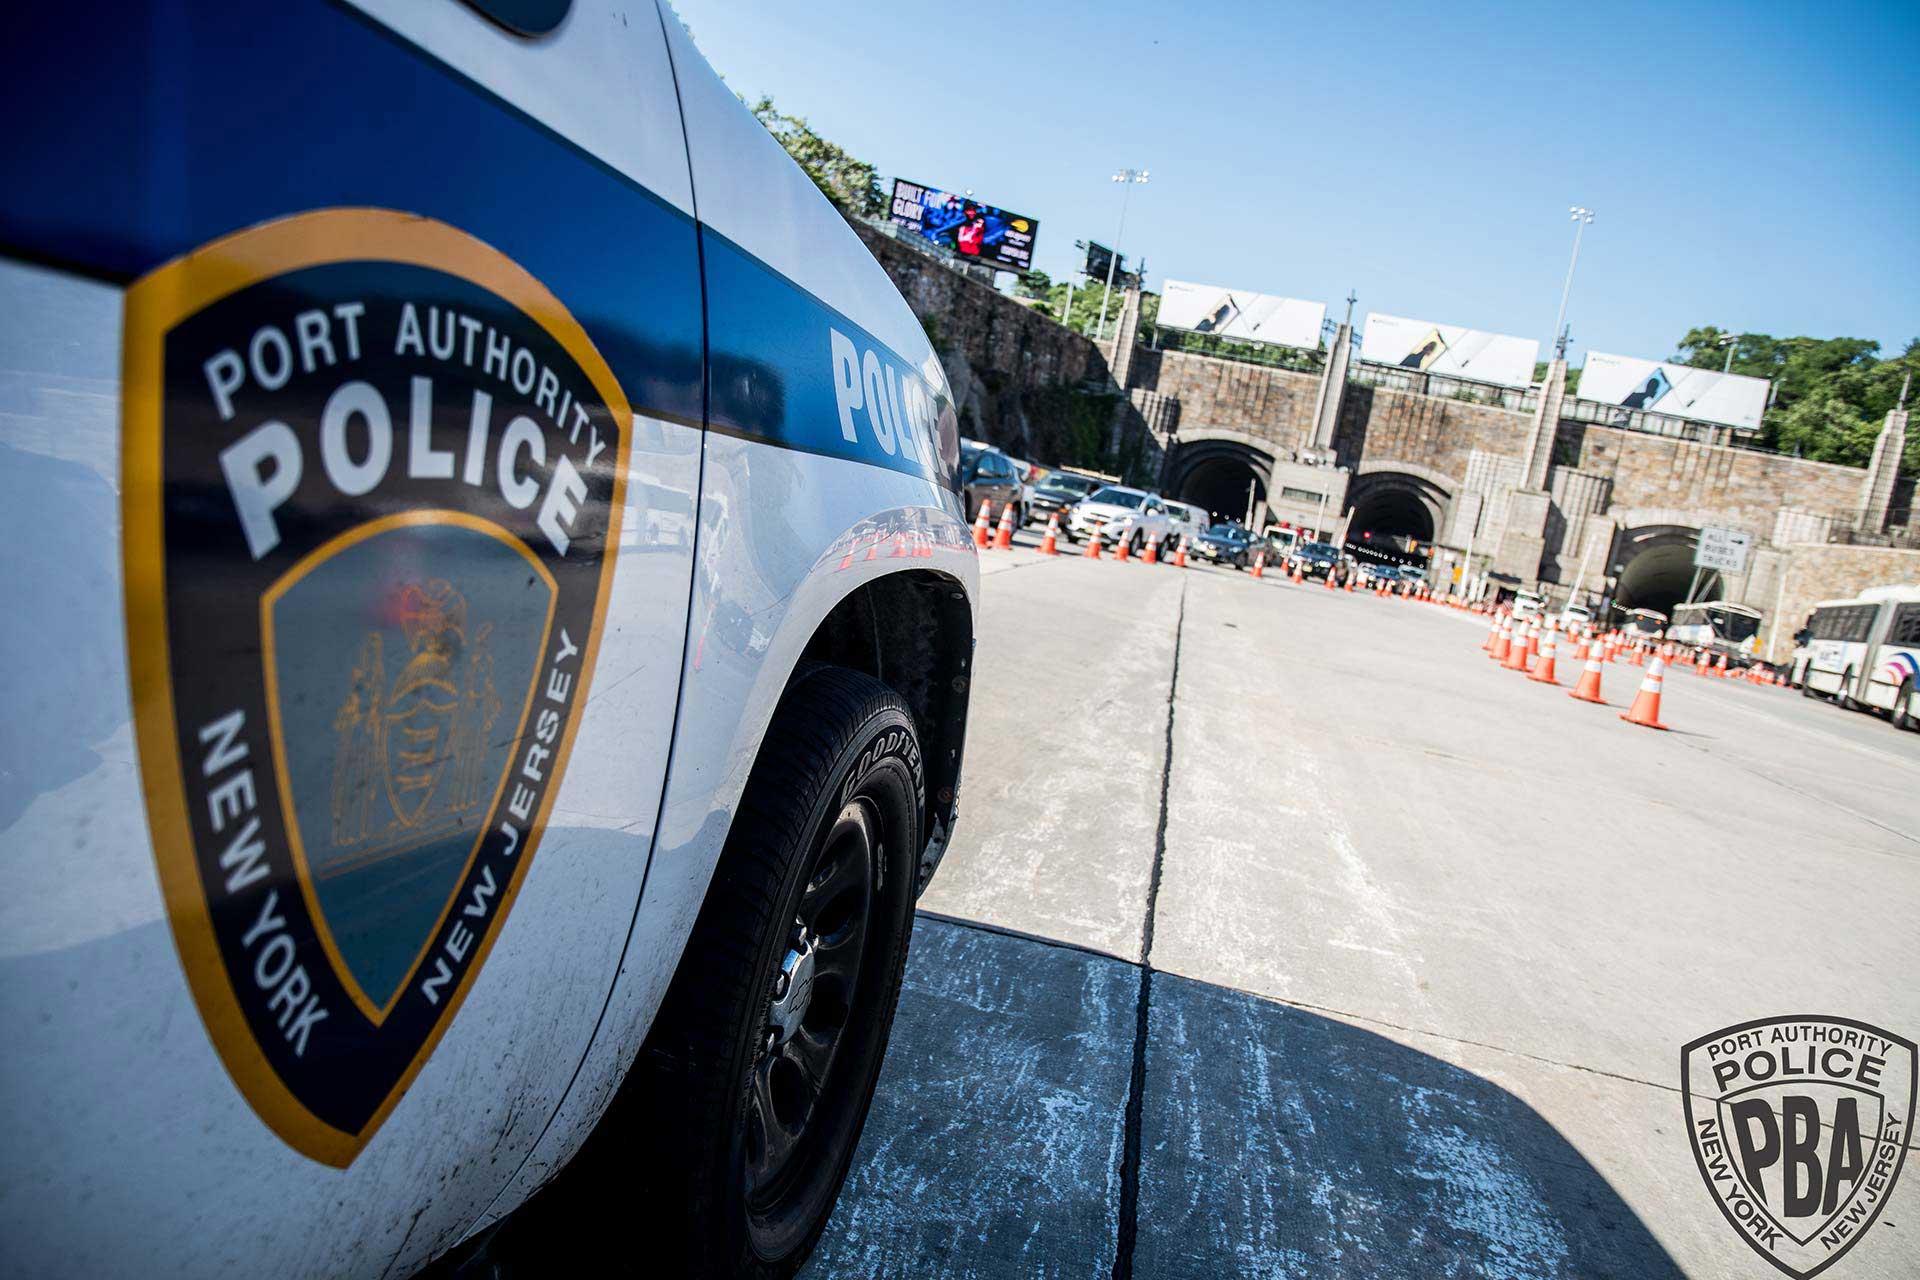 Port Authority Police Benevolent Association Inc